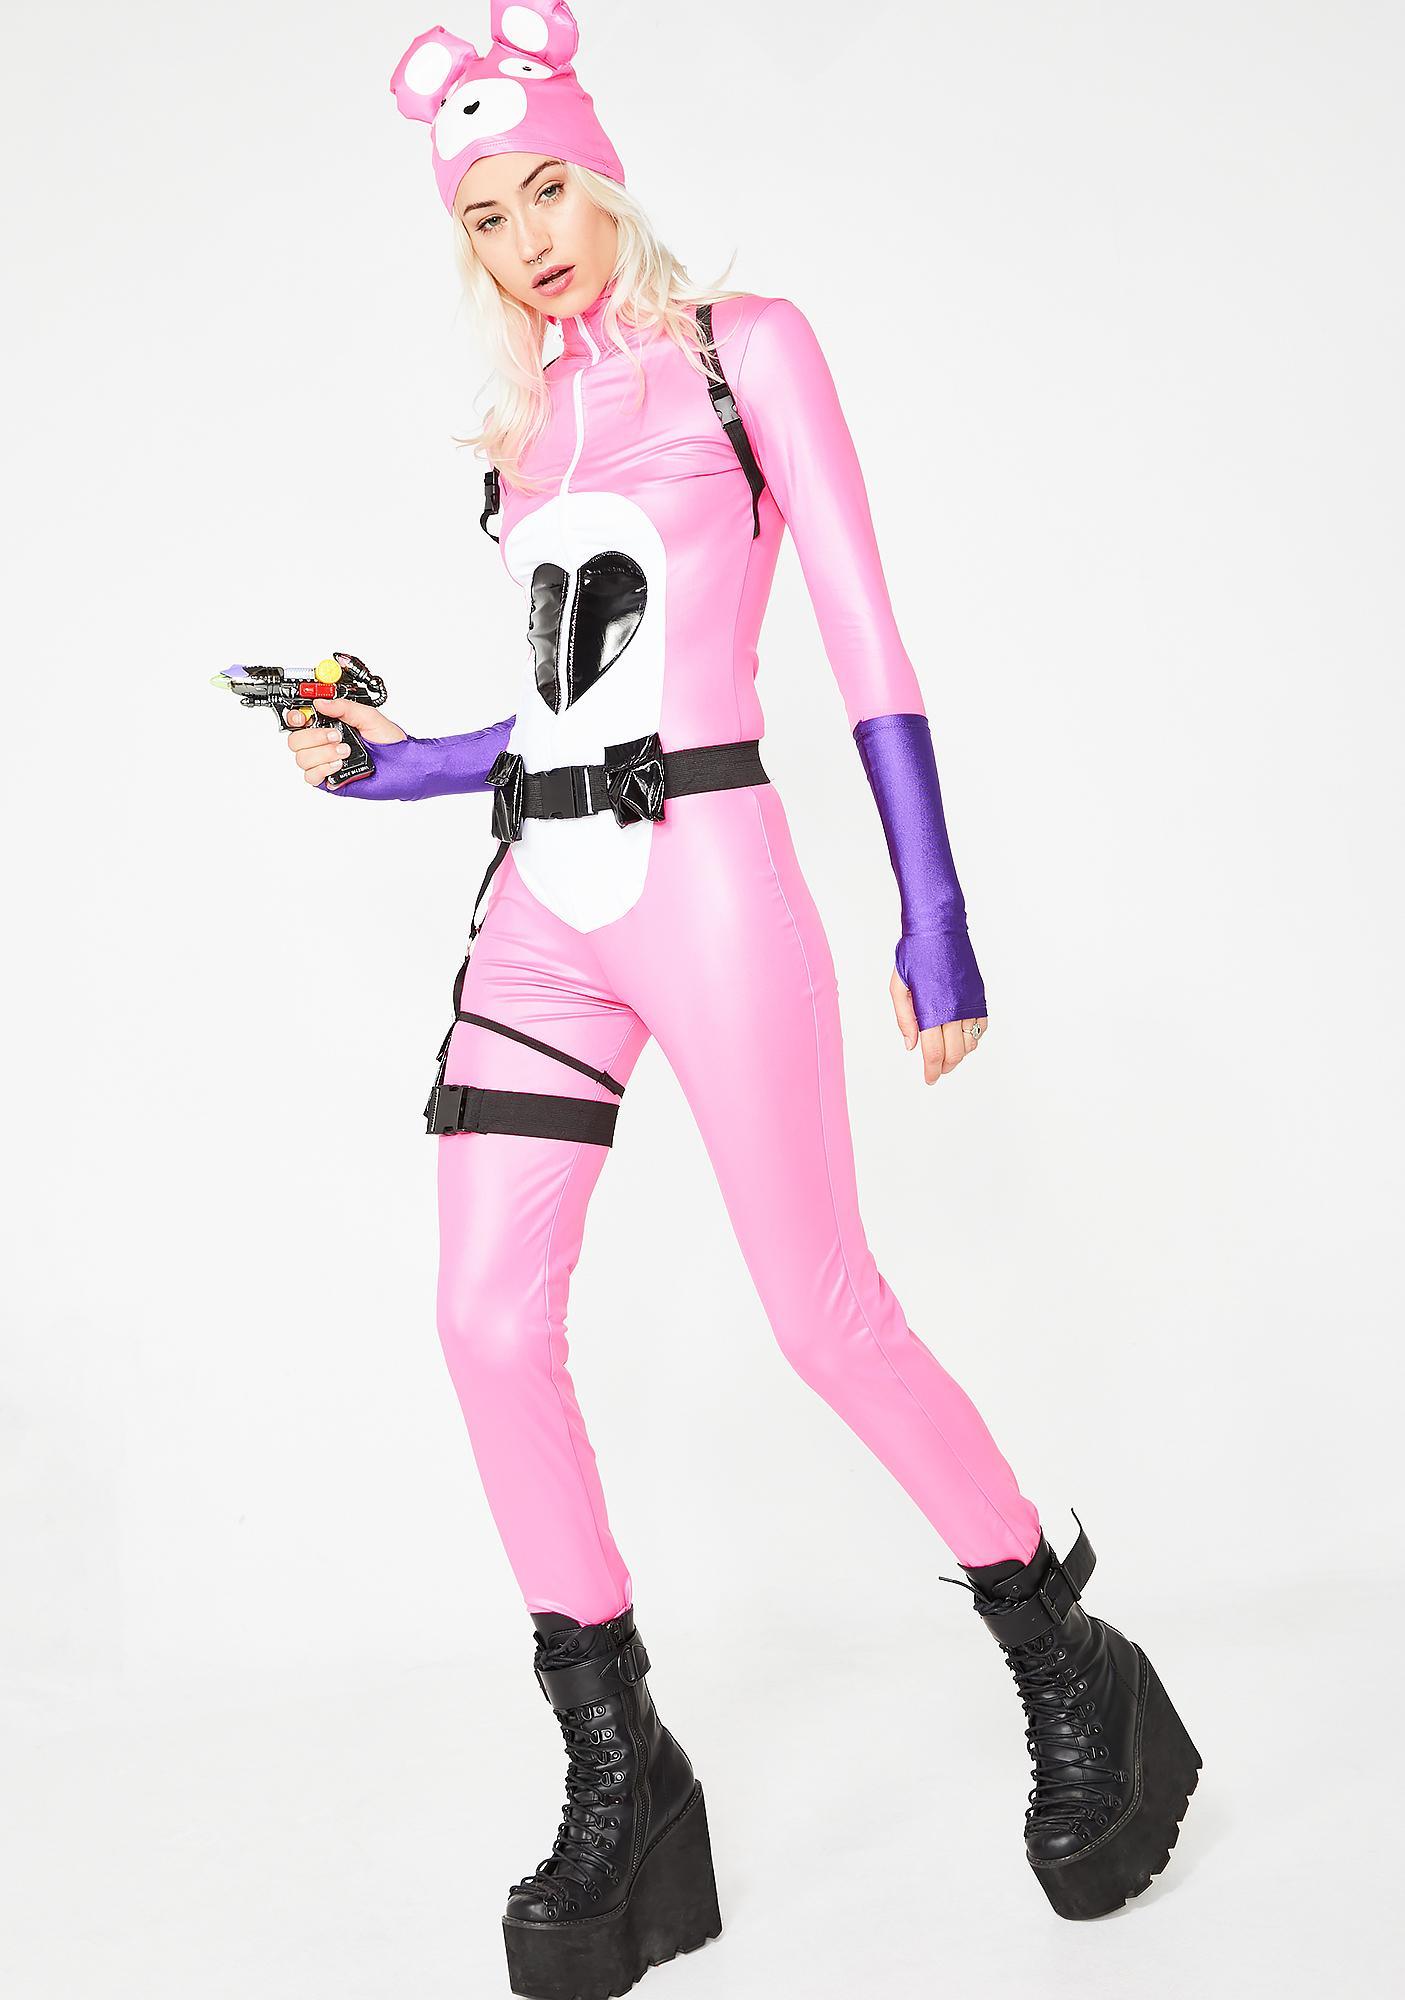 Cuddly Gamer Costume Set